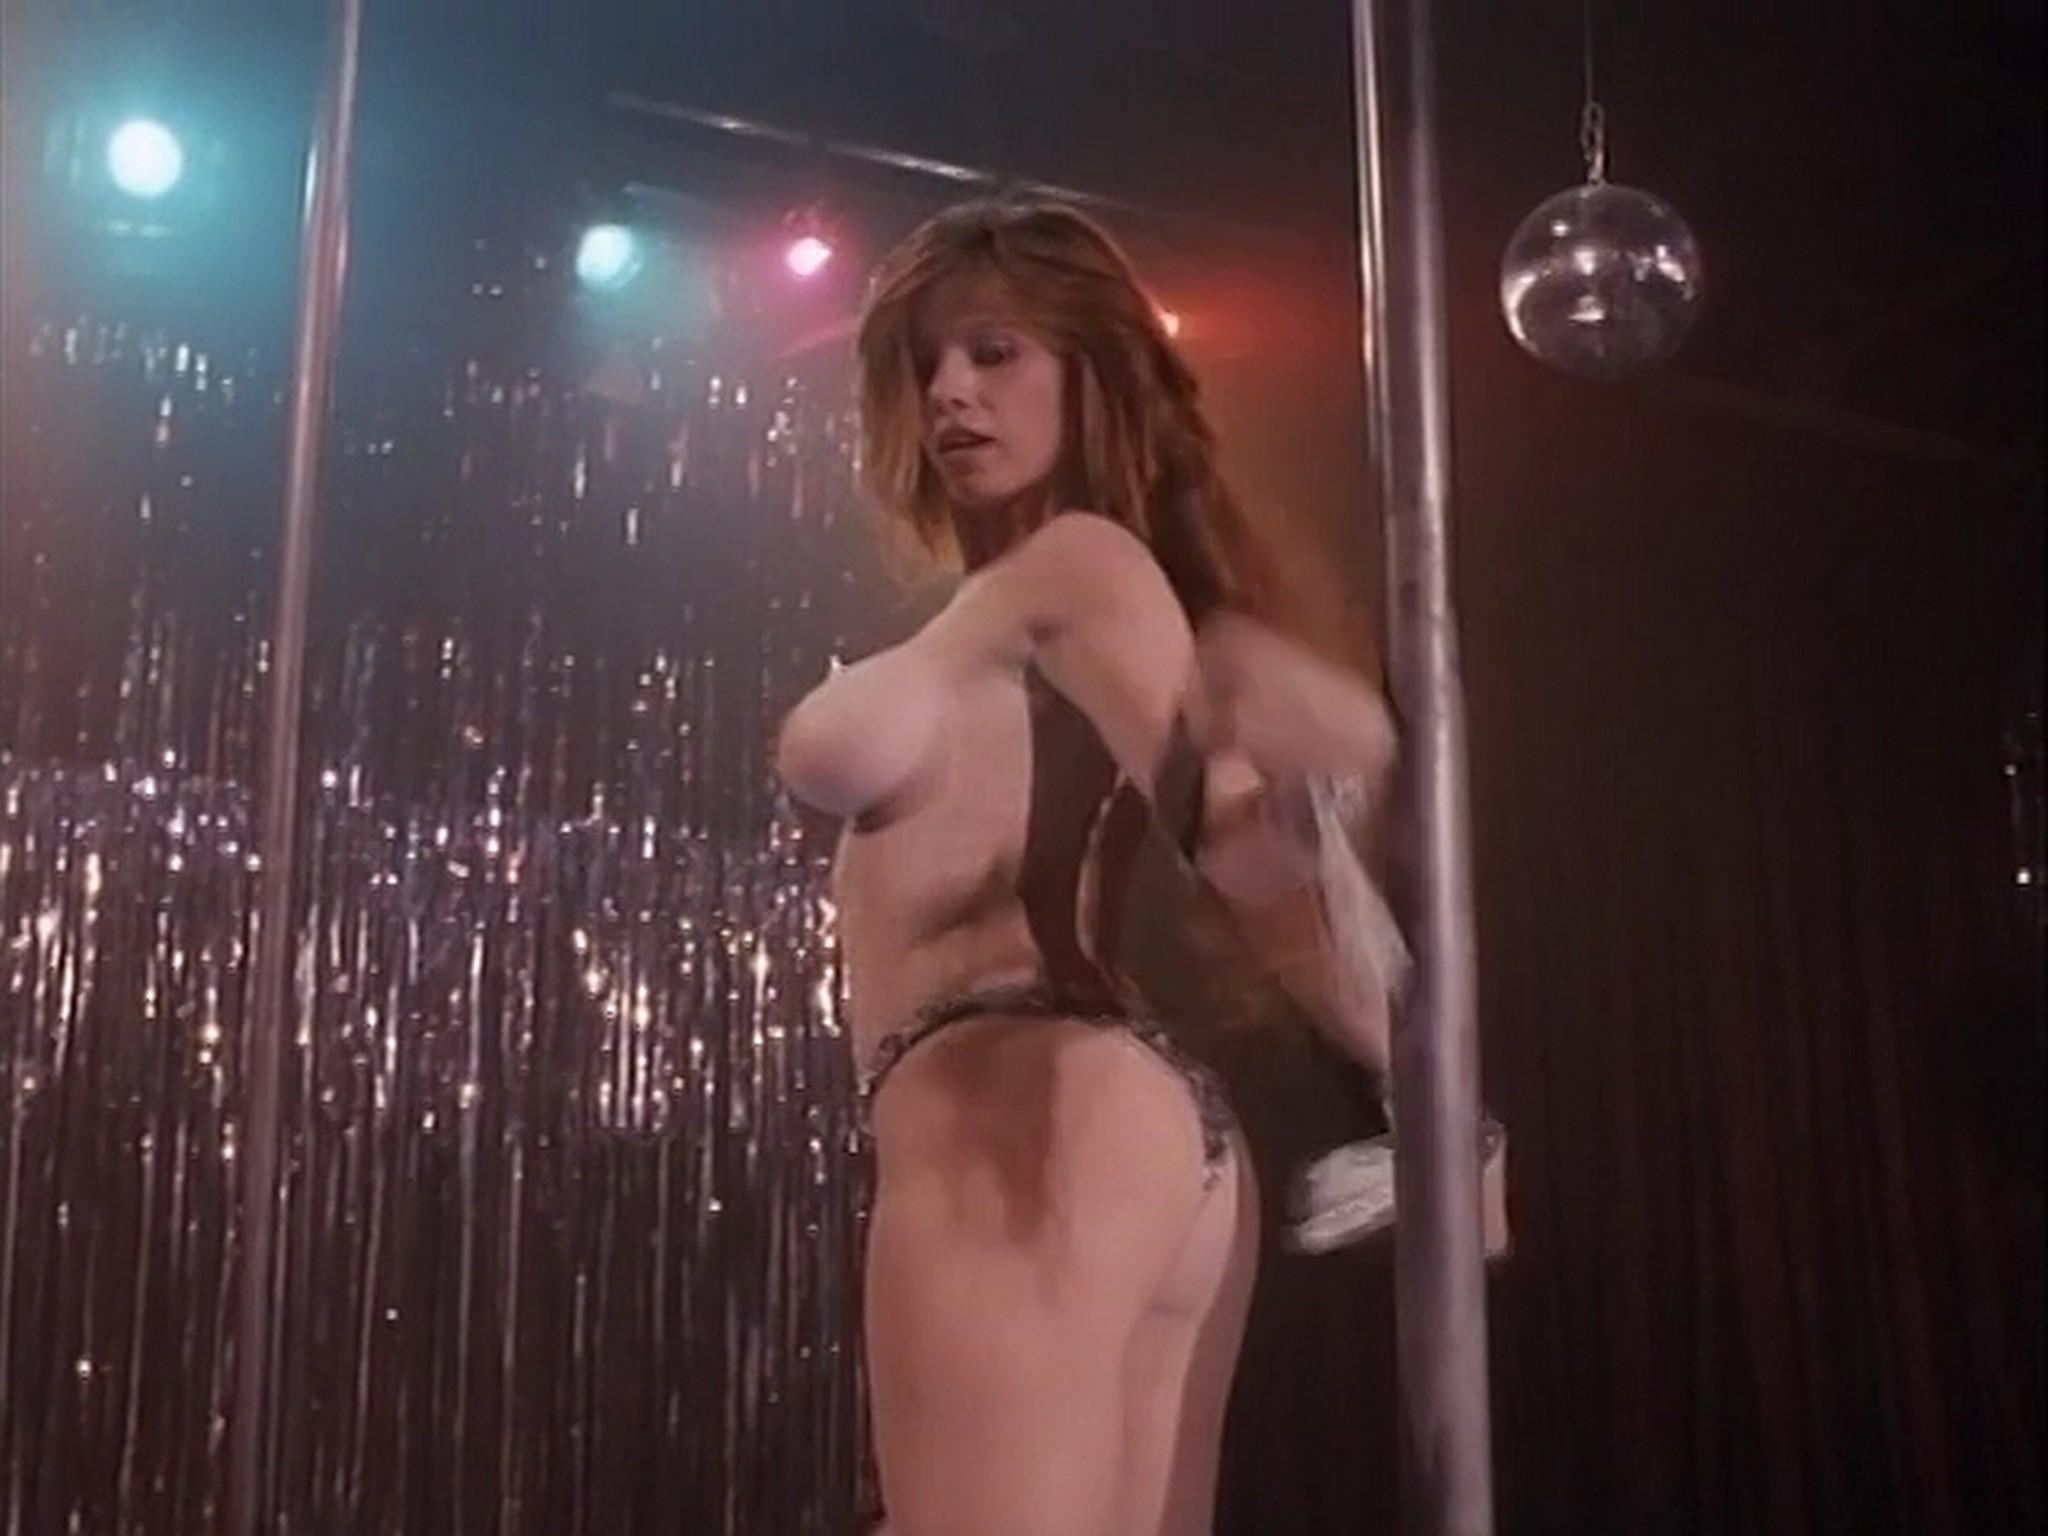 Barbara Alyn Woods nude Catya Sassoon Jill Pierce nude too as strippers Dance with Death 1991 6